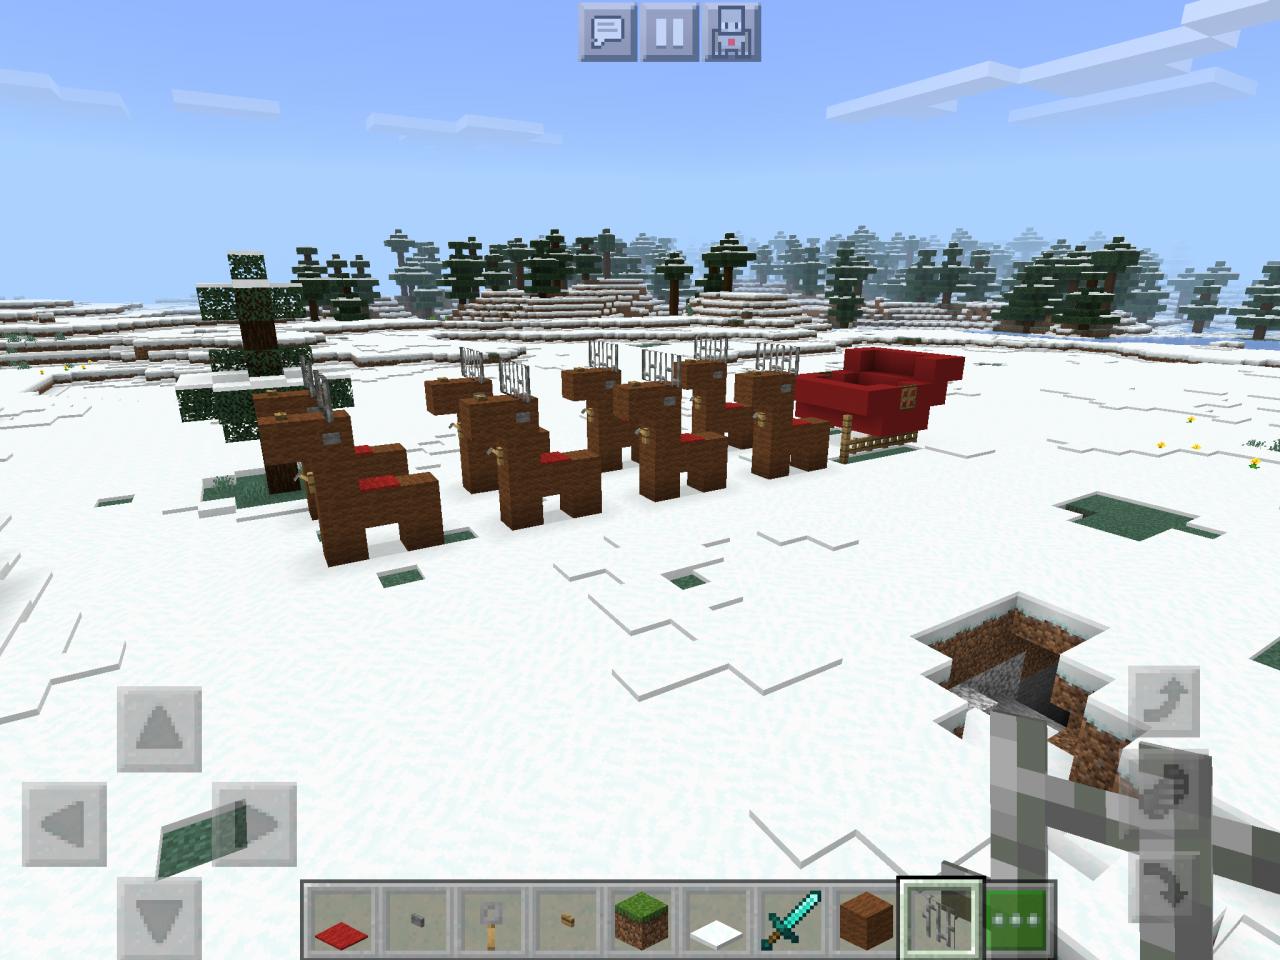 Flere reinsdyr